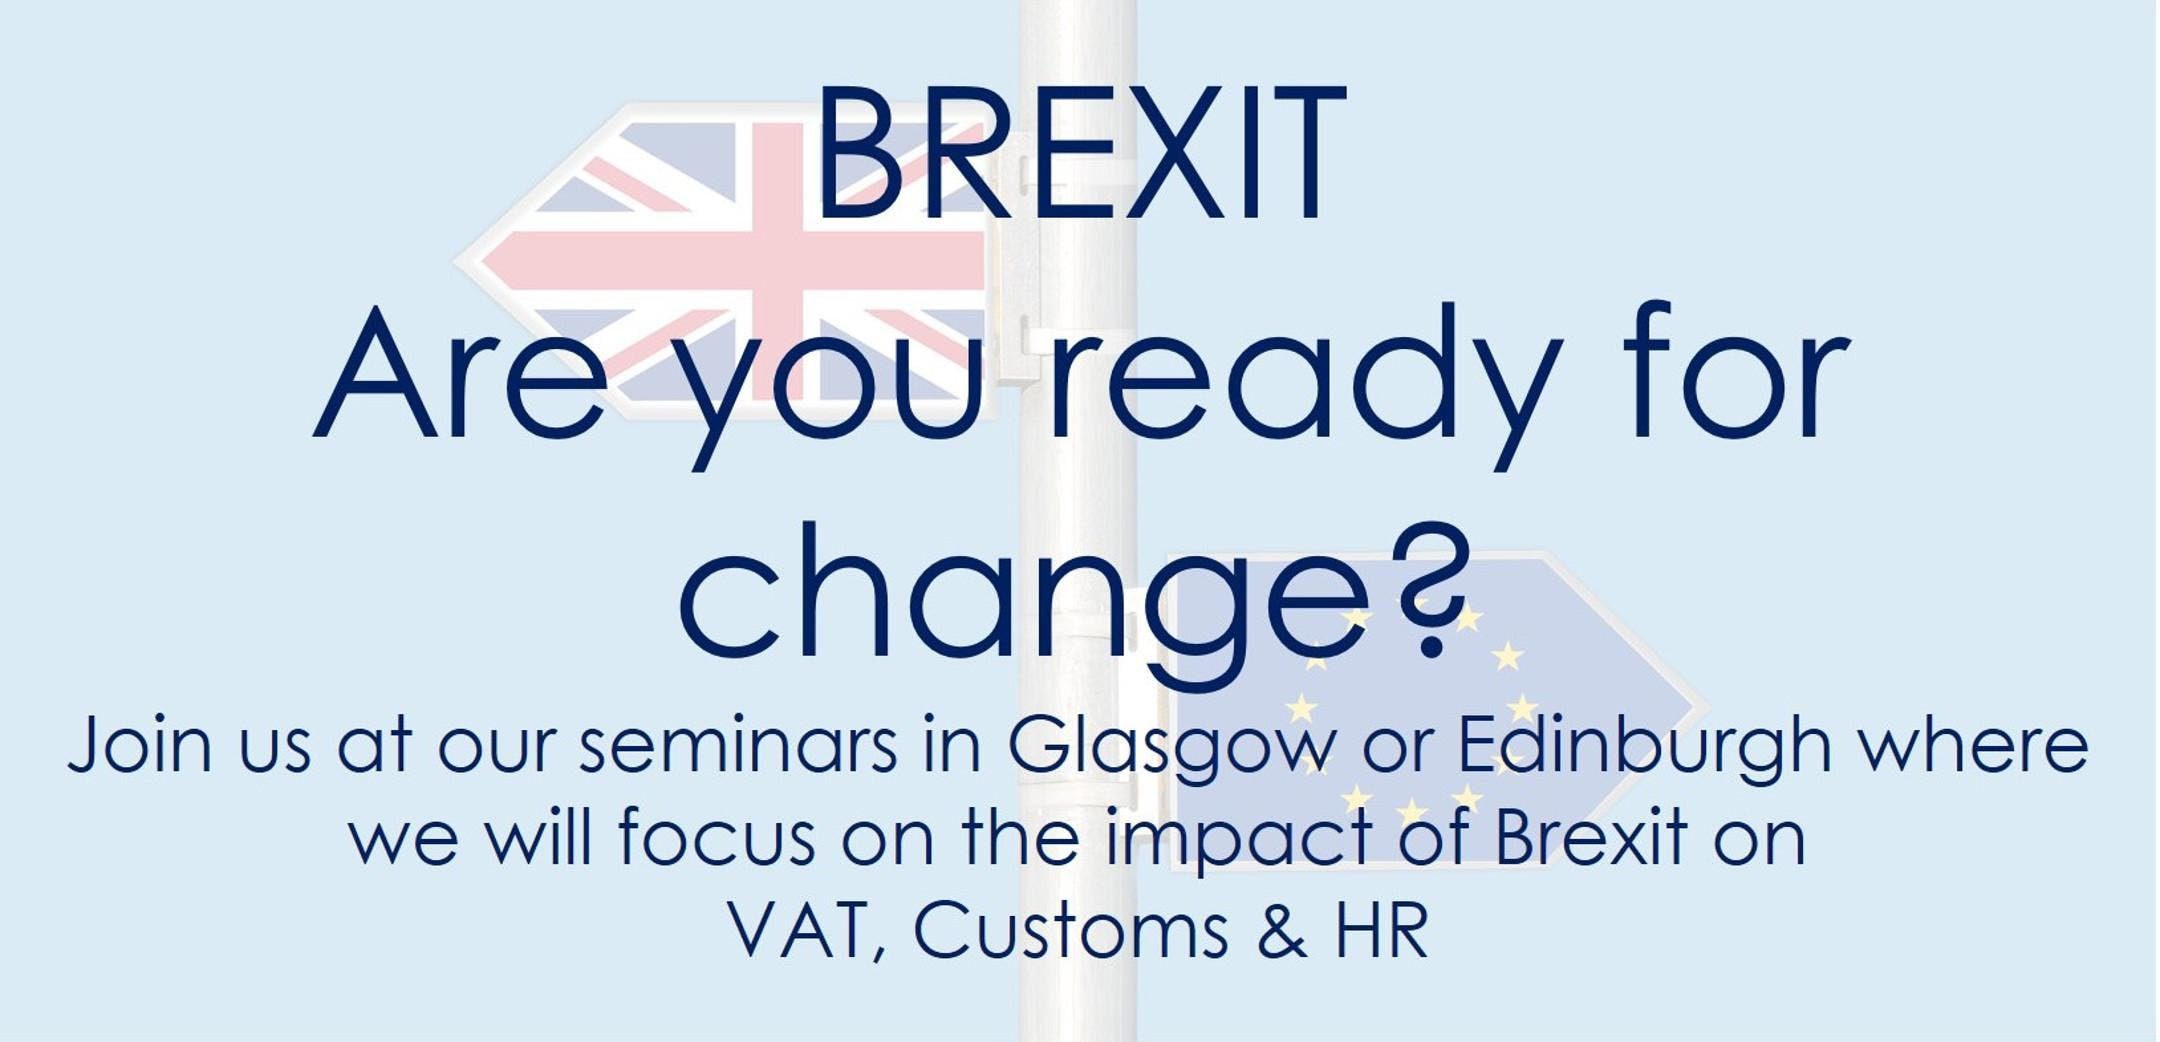 French Duncan Brexit seminar - Glasgow